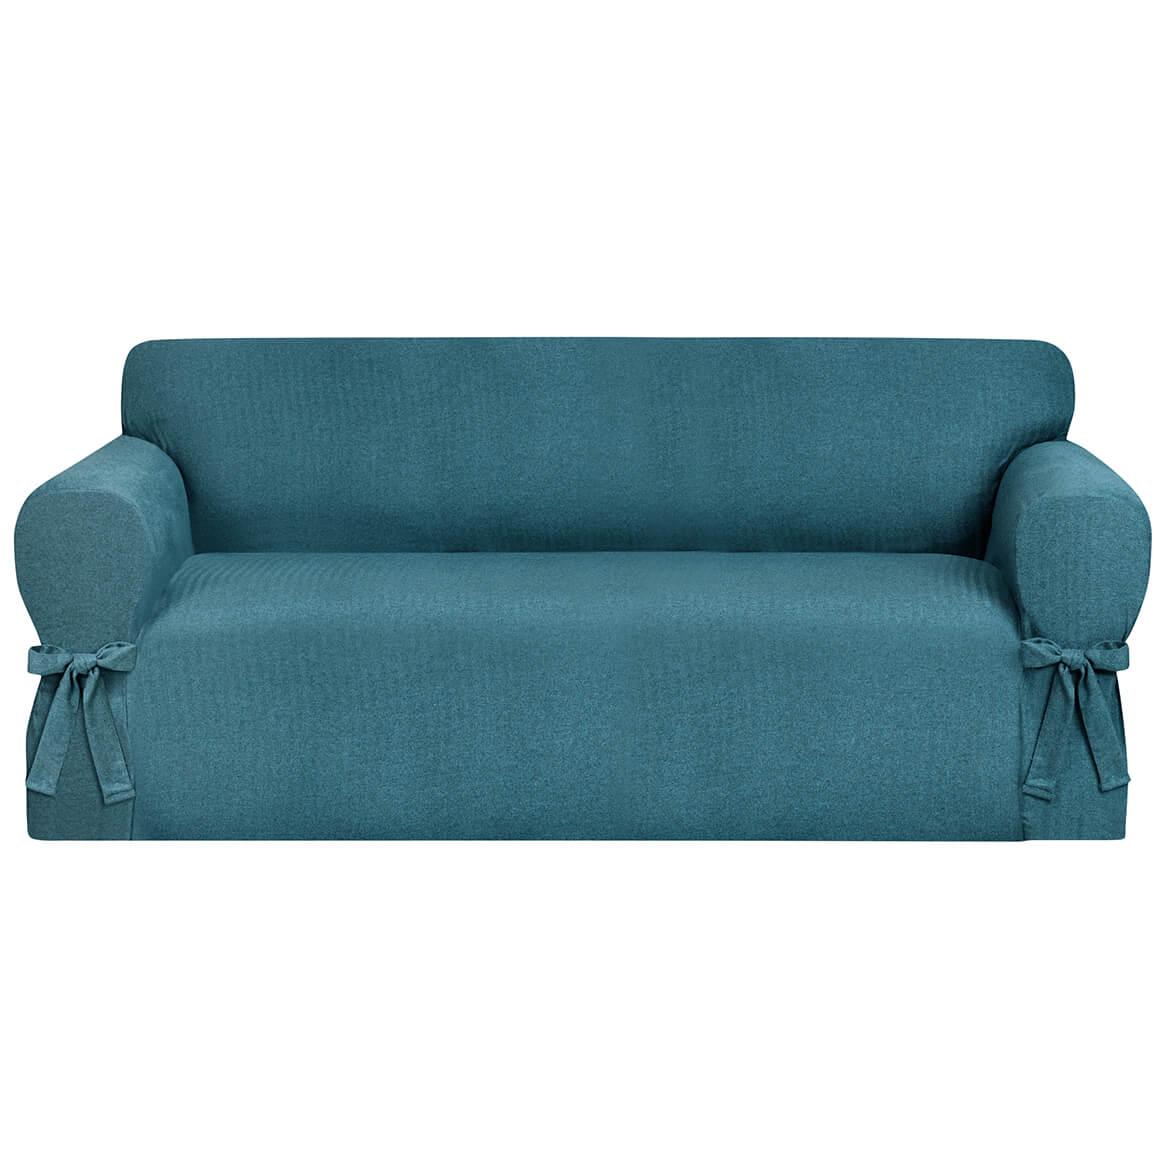 Kathy Ireland Evening Flannel Sofa Slipcover-364172